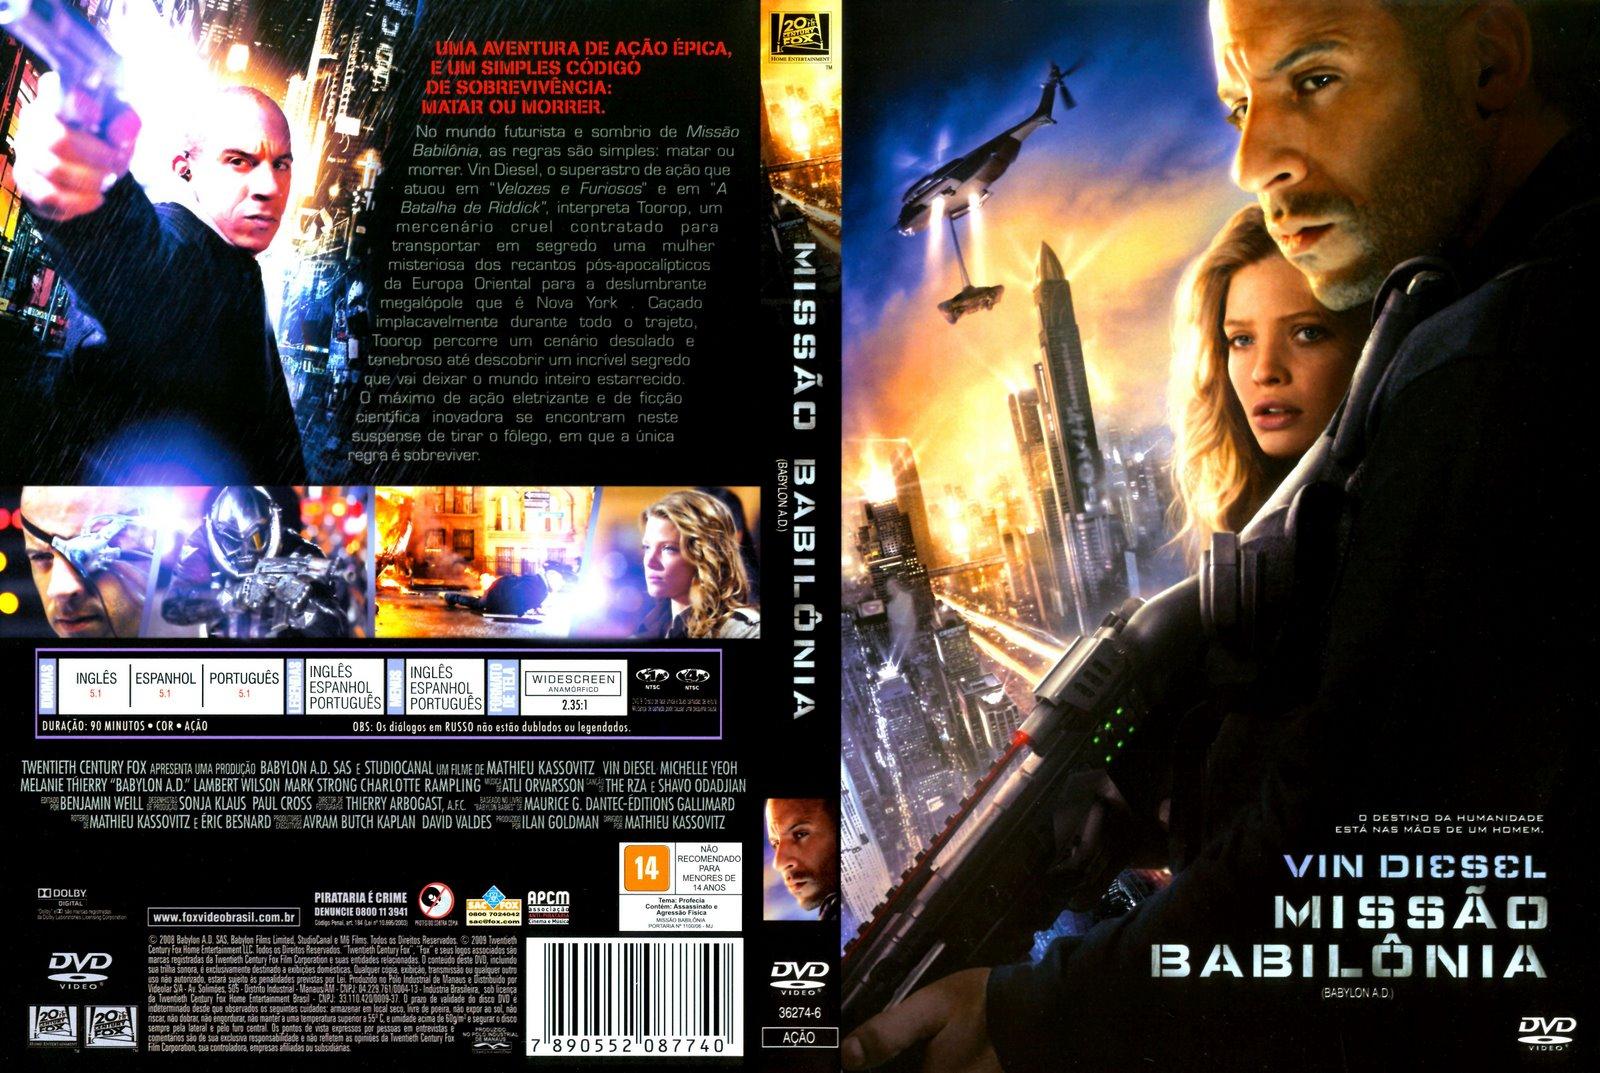 filme missao babilonia dublado rmvb